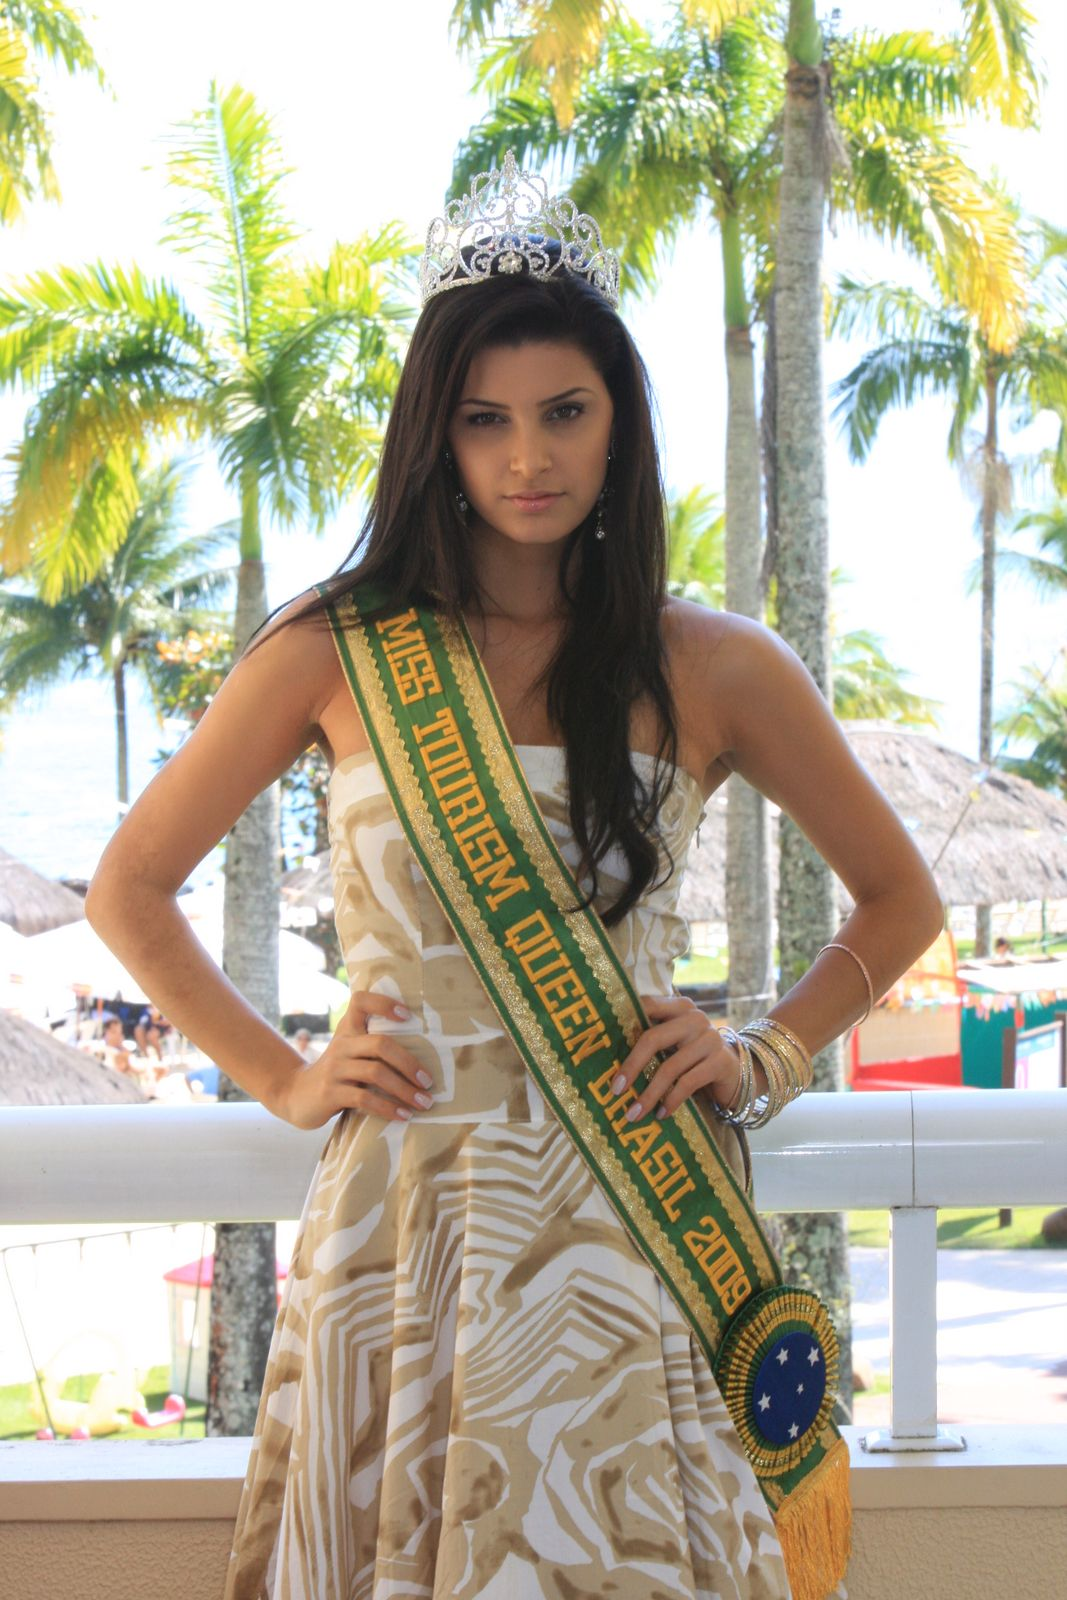 vivian noronha, rainha hispanoamericana 2008. suplente. - Página 4 Tk6gbly9